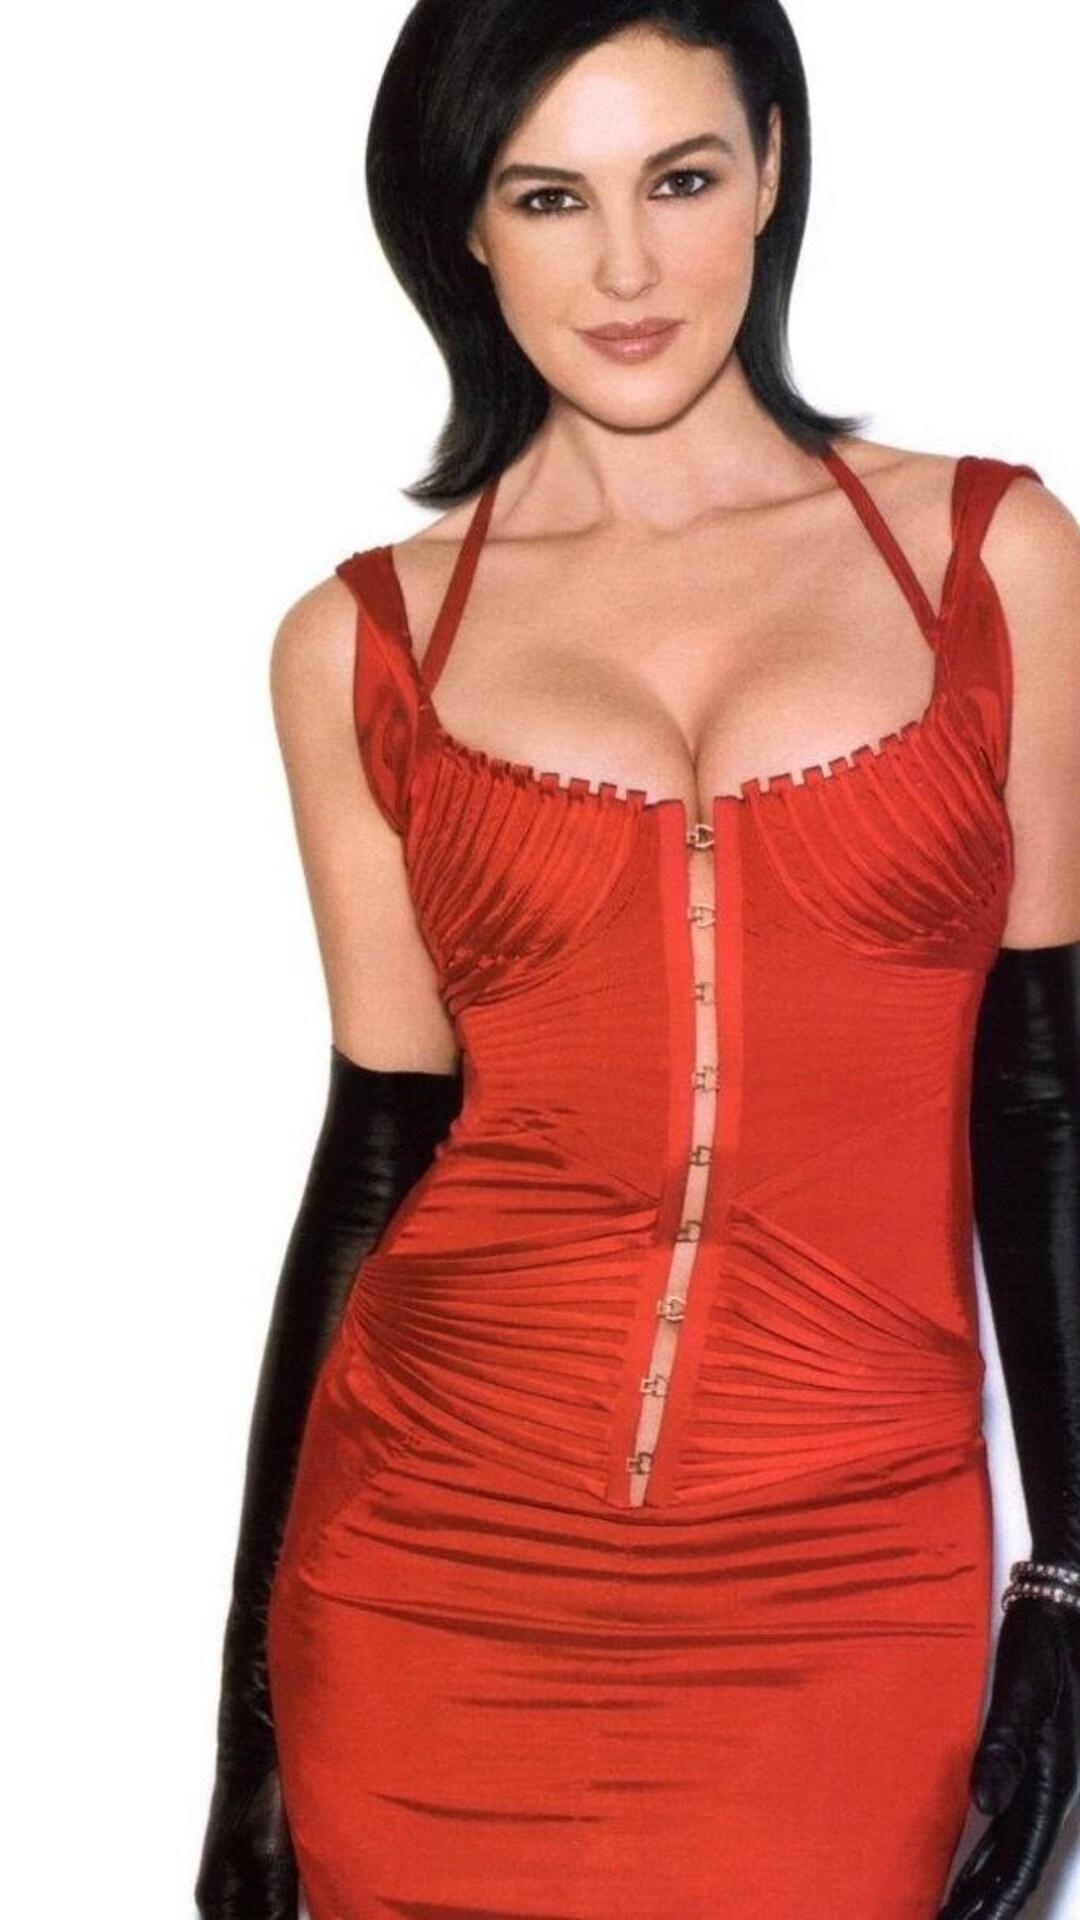 Foto desnuda gratis monica bellucci pic 22